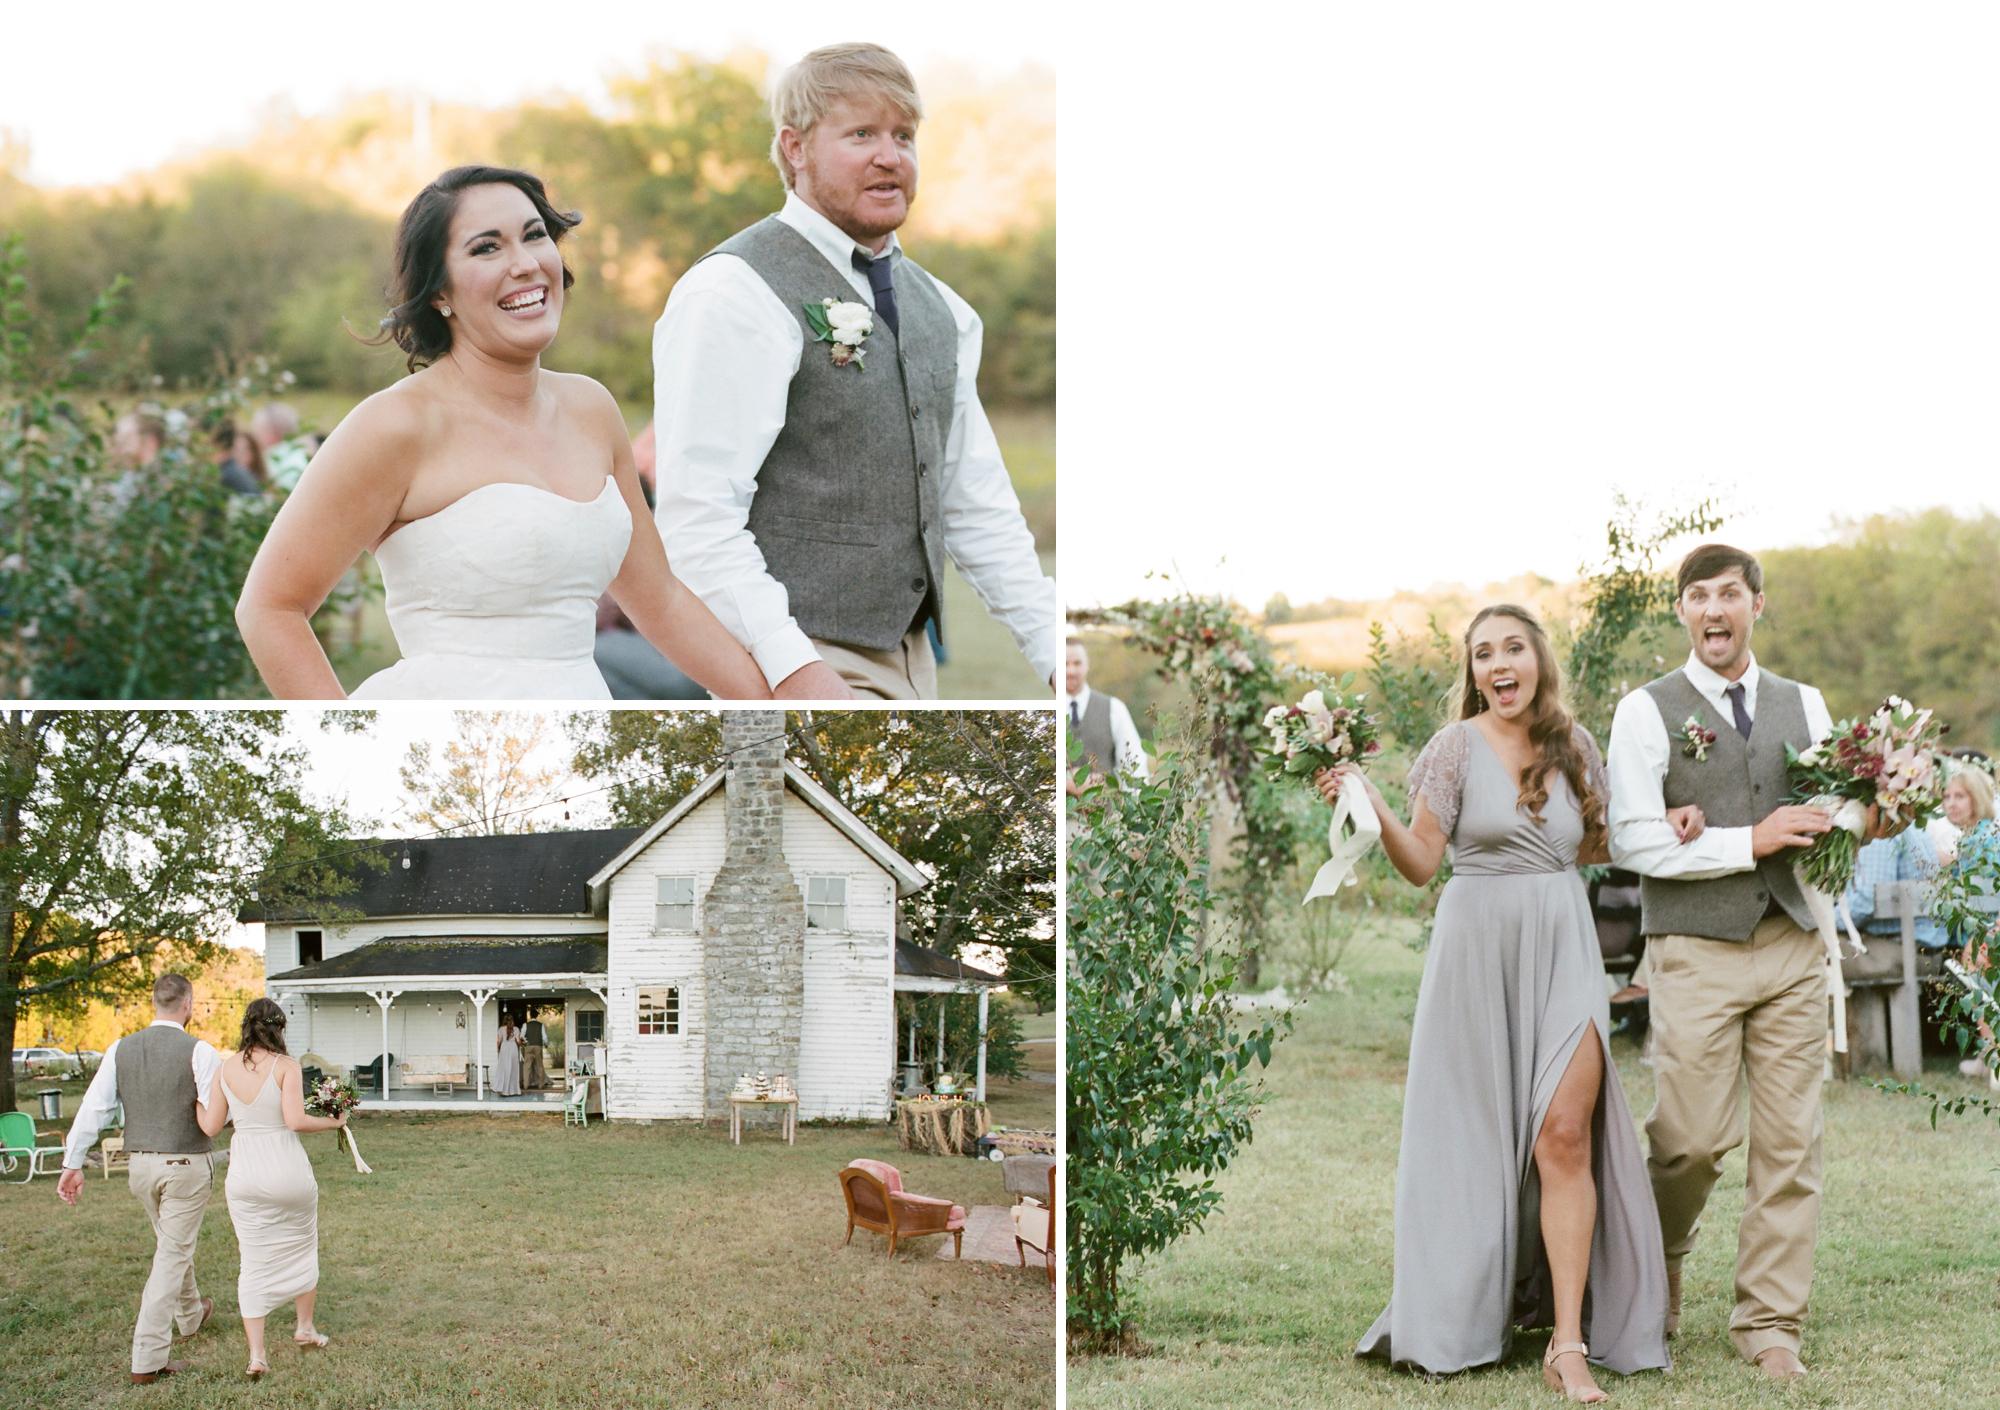 southern-weddings-film-photographer_0047